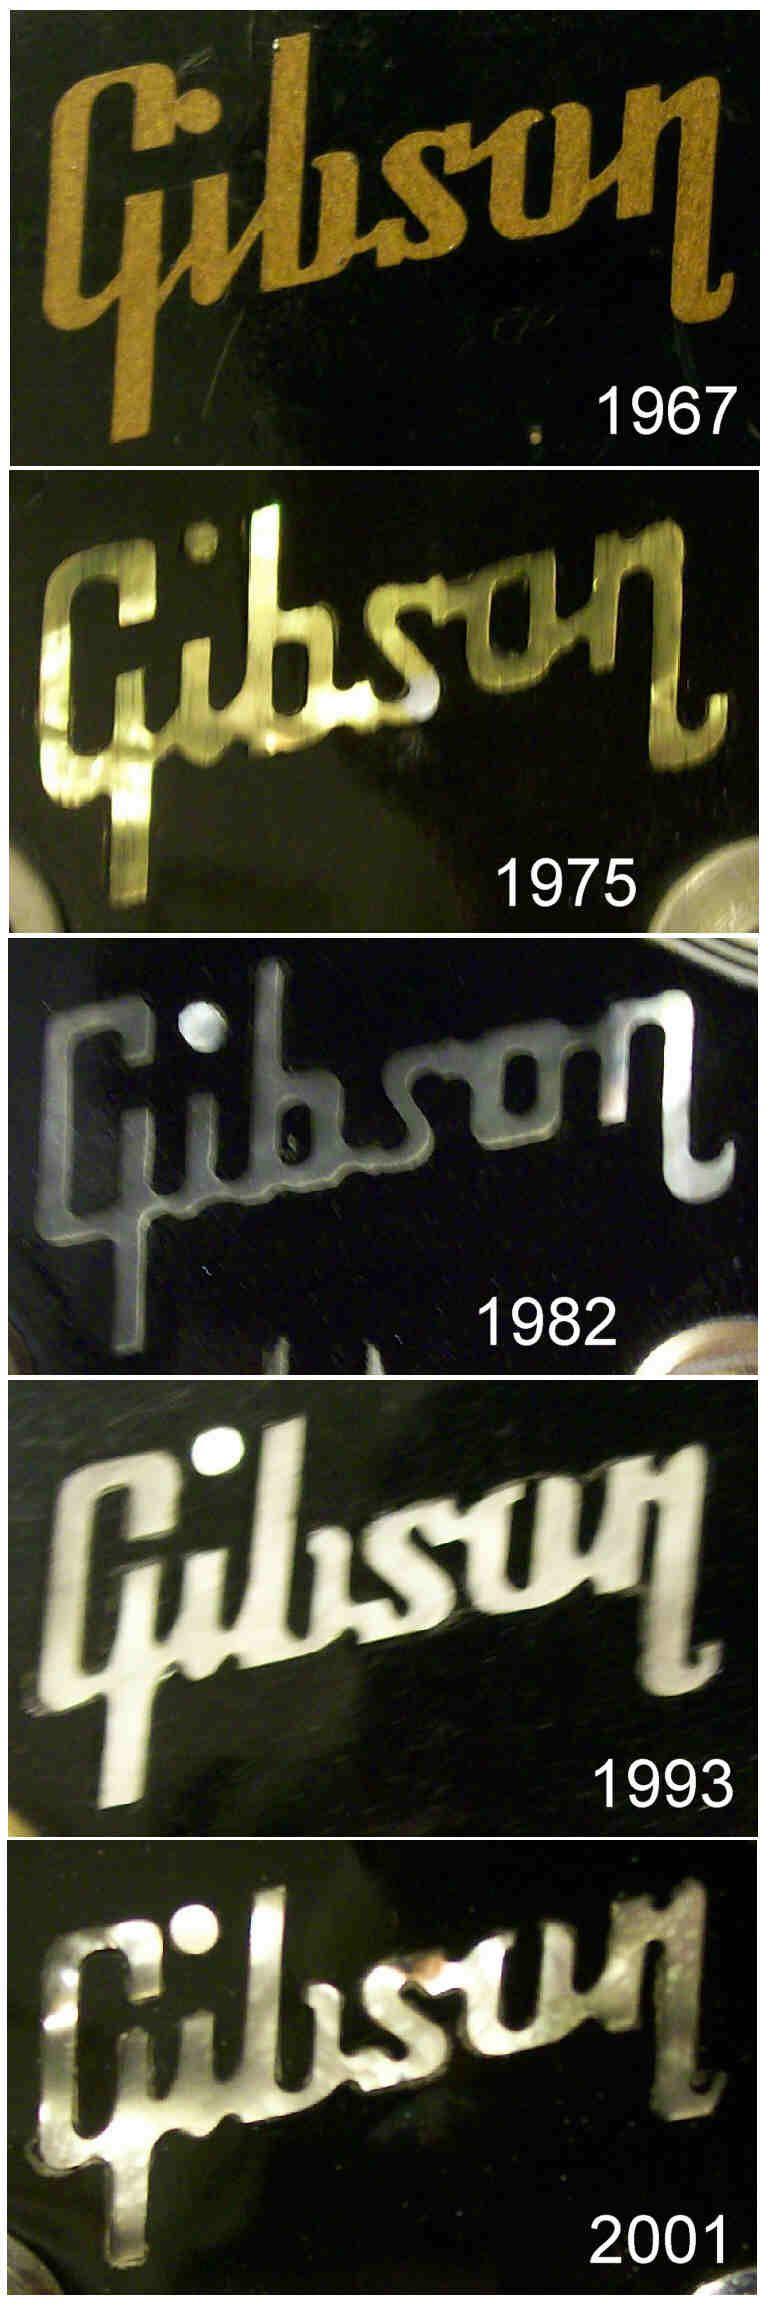 Gibson Headstock Logos : gibson, headstock, logos, Gibson, Headstock, Inlays, Through, Years, Paul,, Guitars,